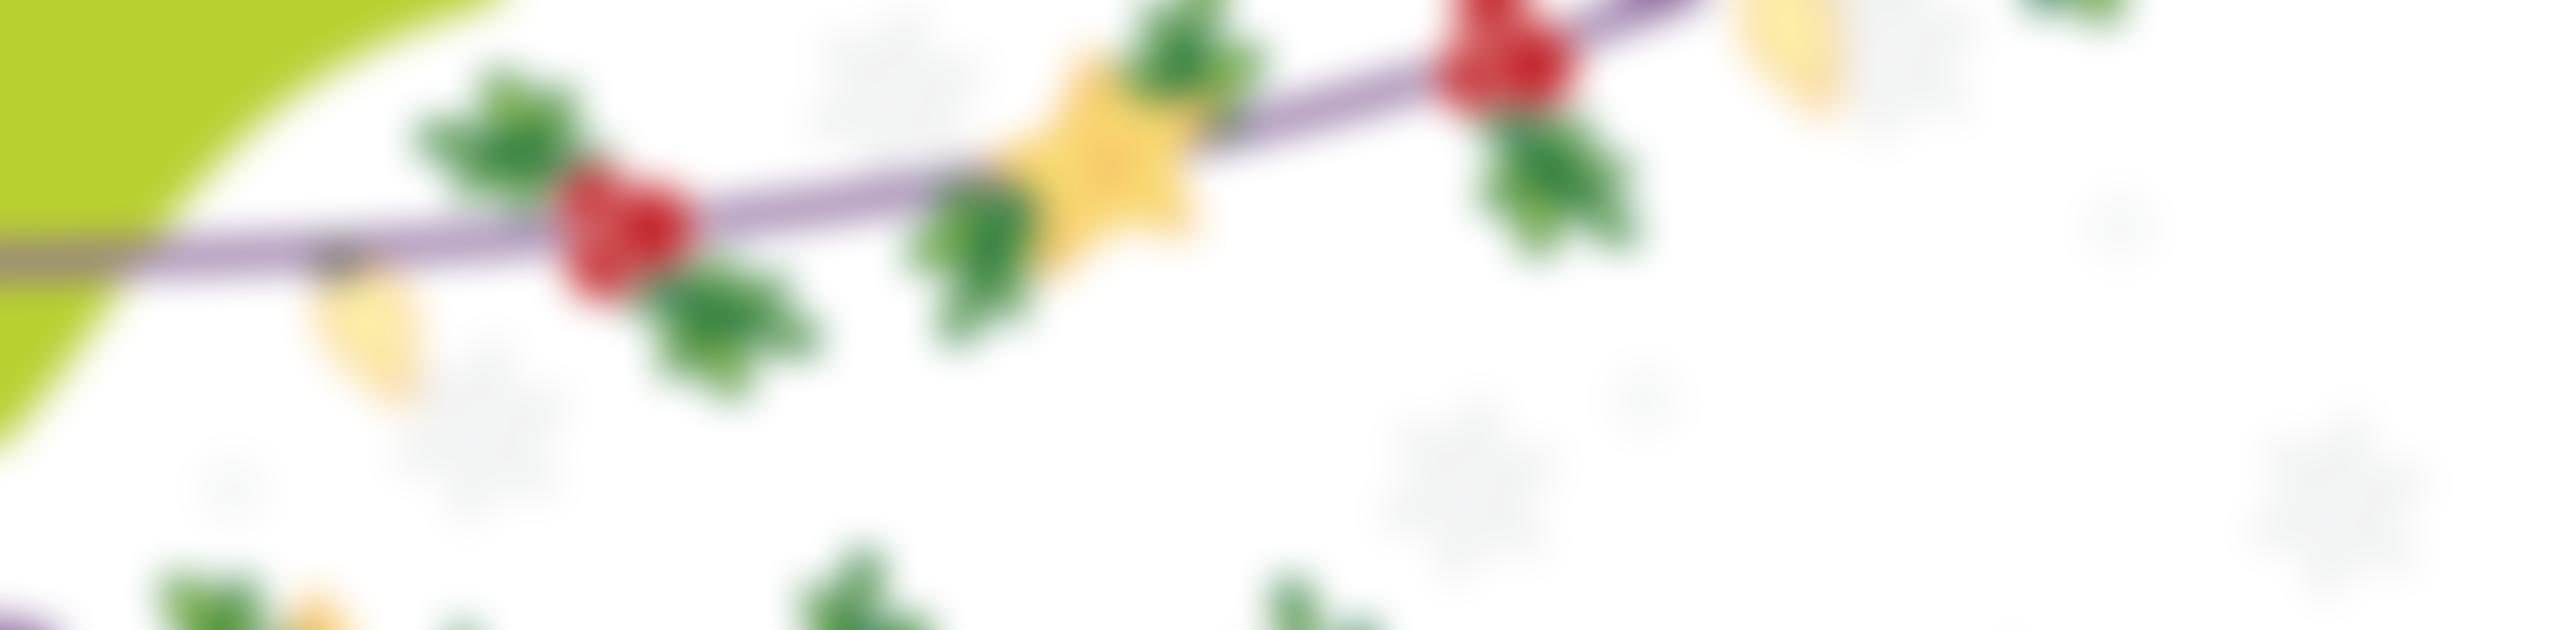 Door 24 - #SDsanta - The SDN Advent Calendar